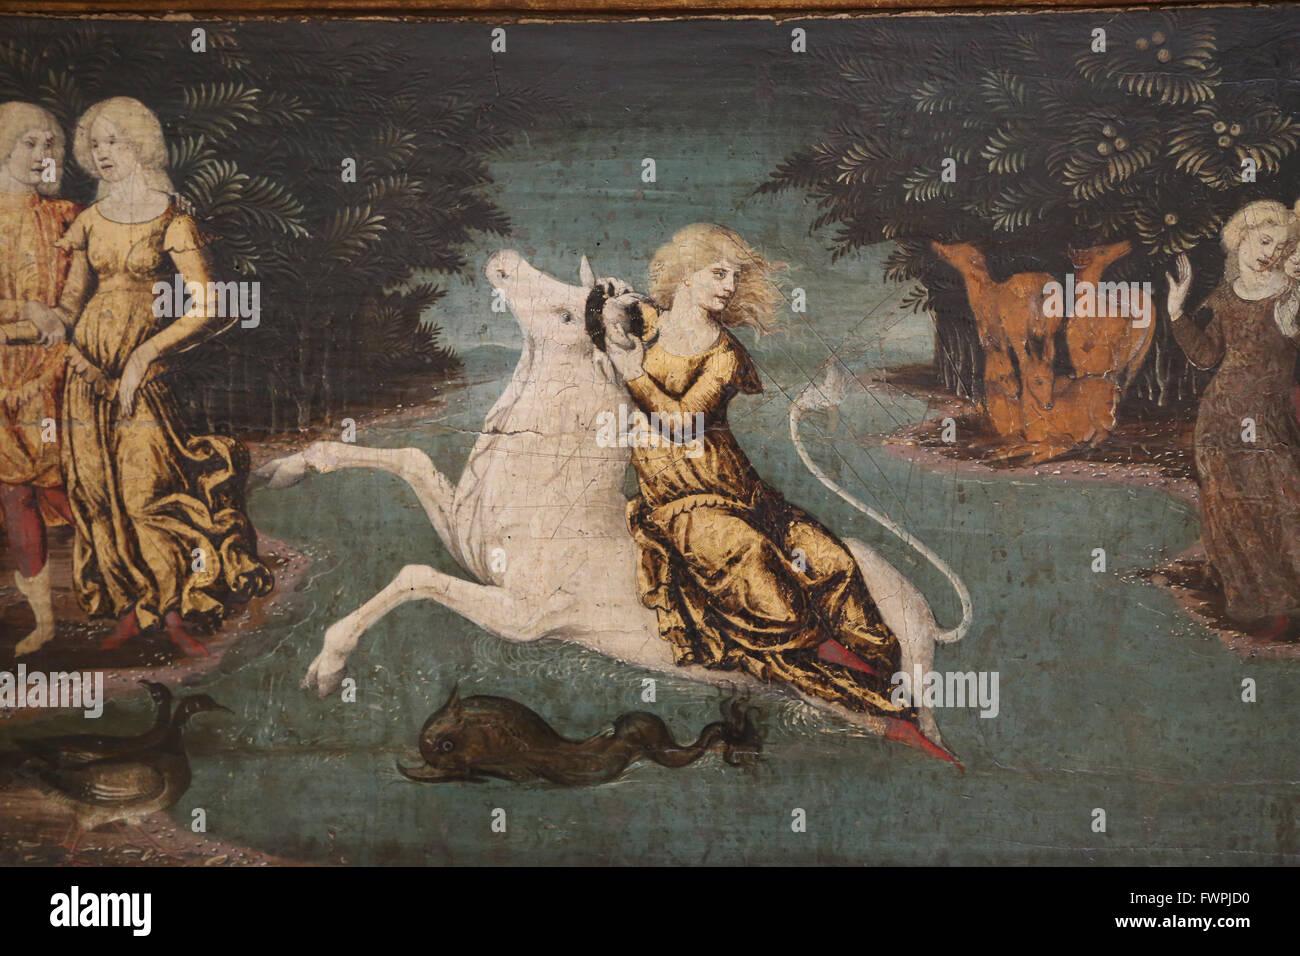 Libera da Verona (1441-1526). Italian painter of the Renaissance.  The Abduction of Europe, 1470. Louvre Museum. - Stock Image